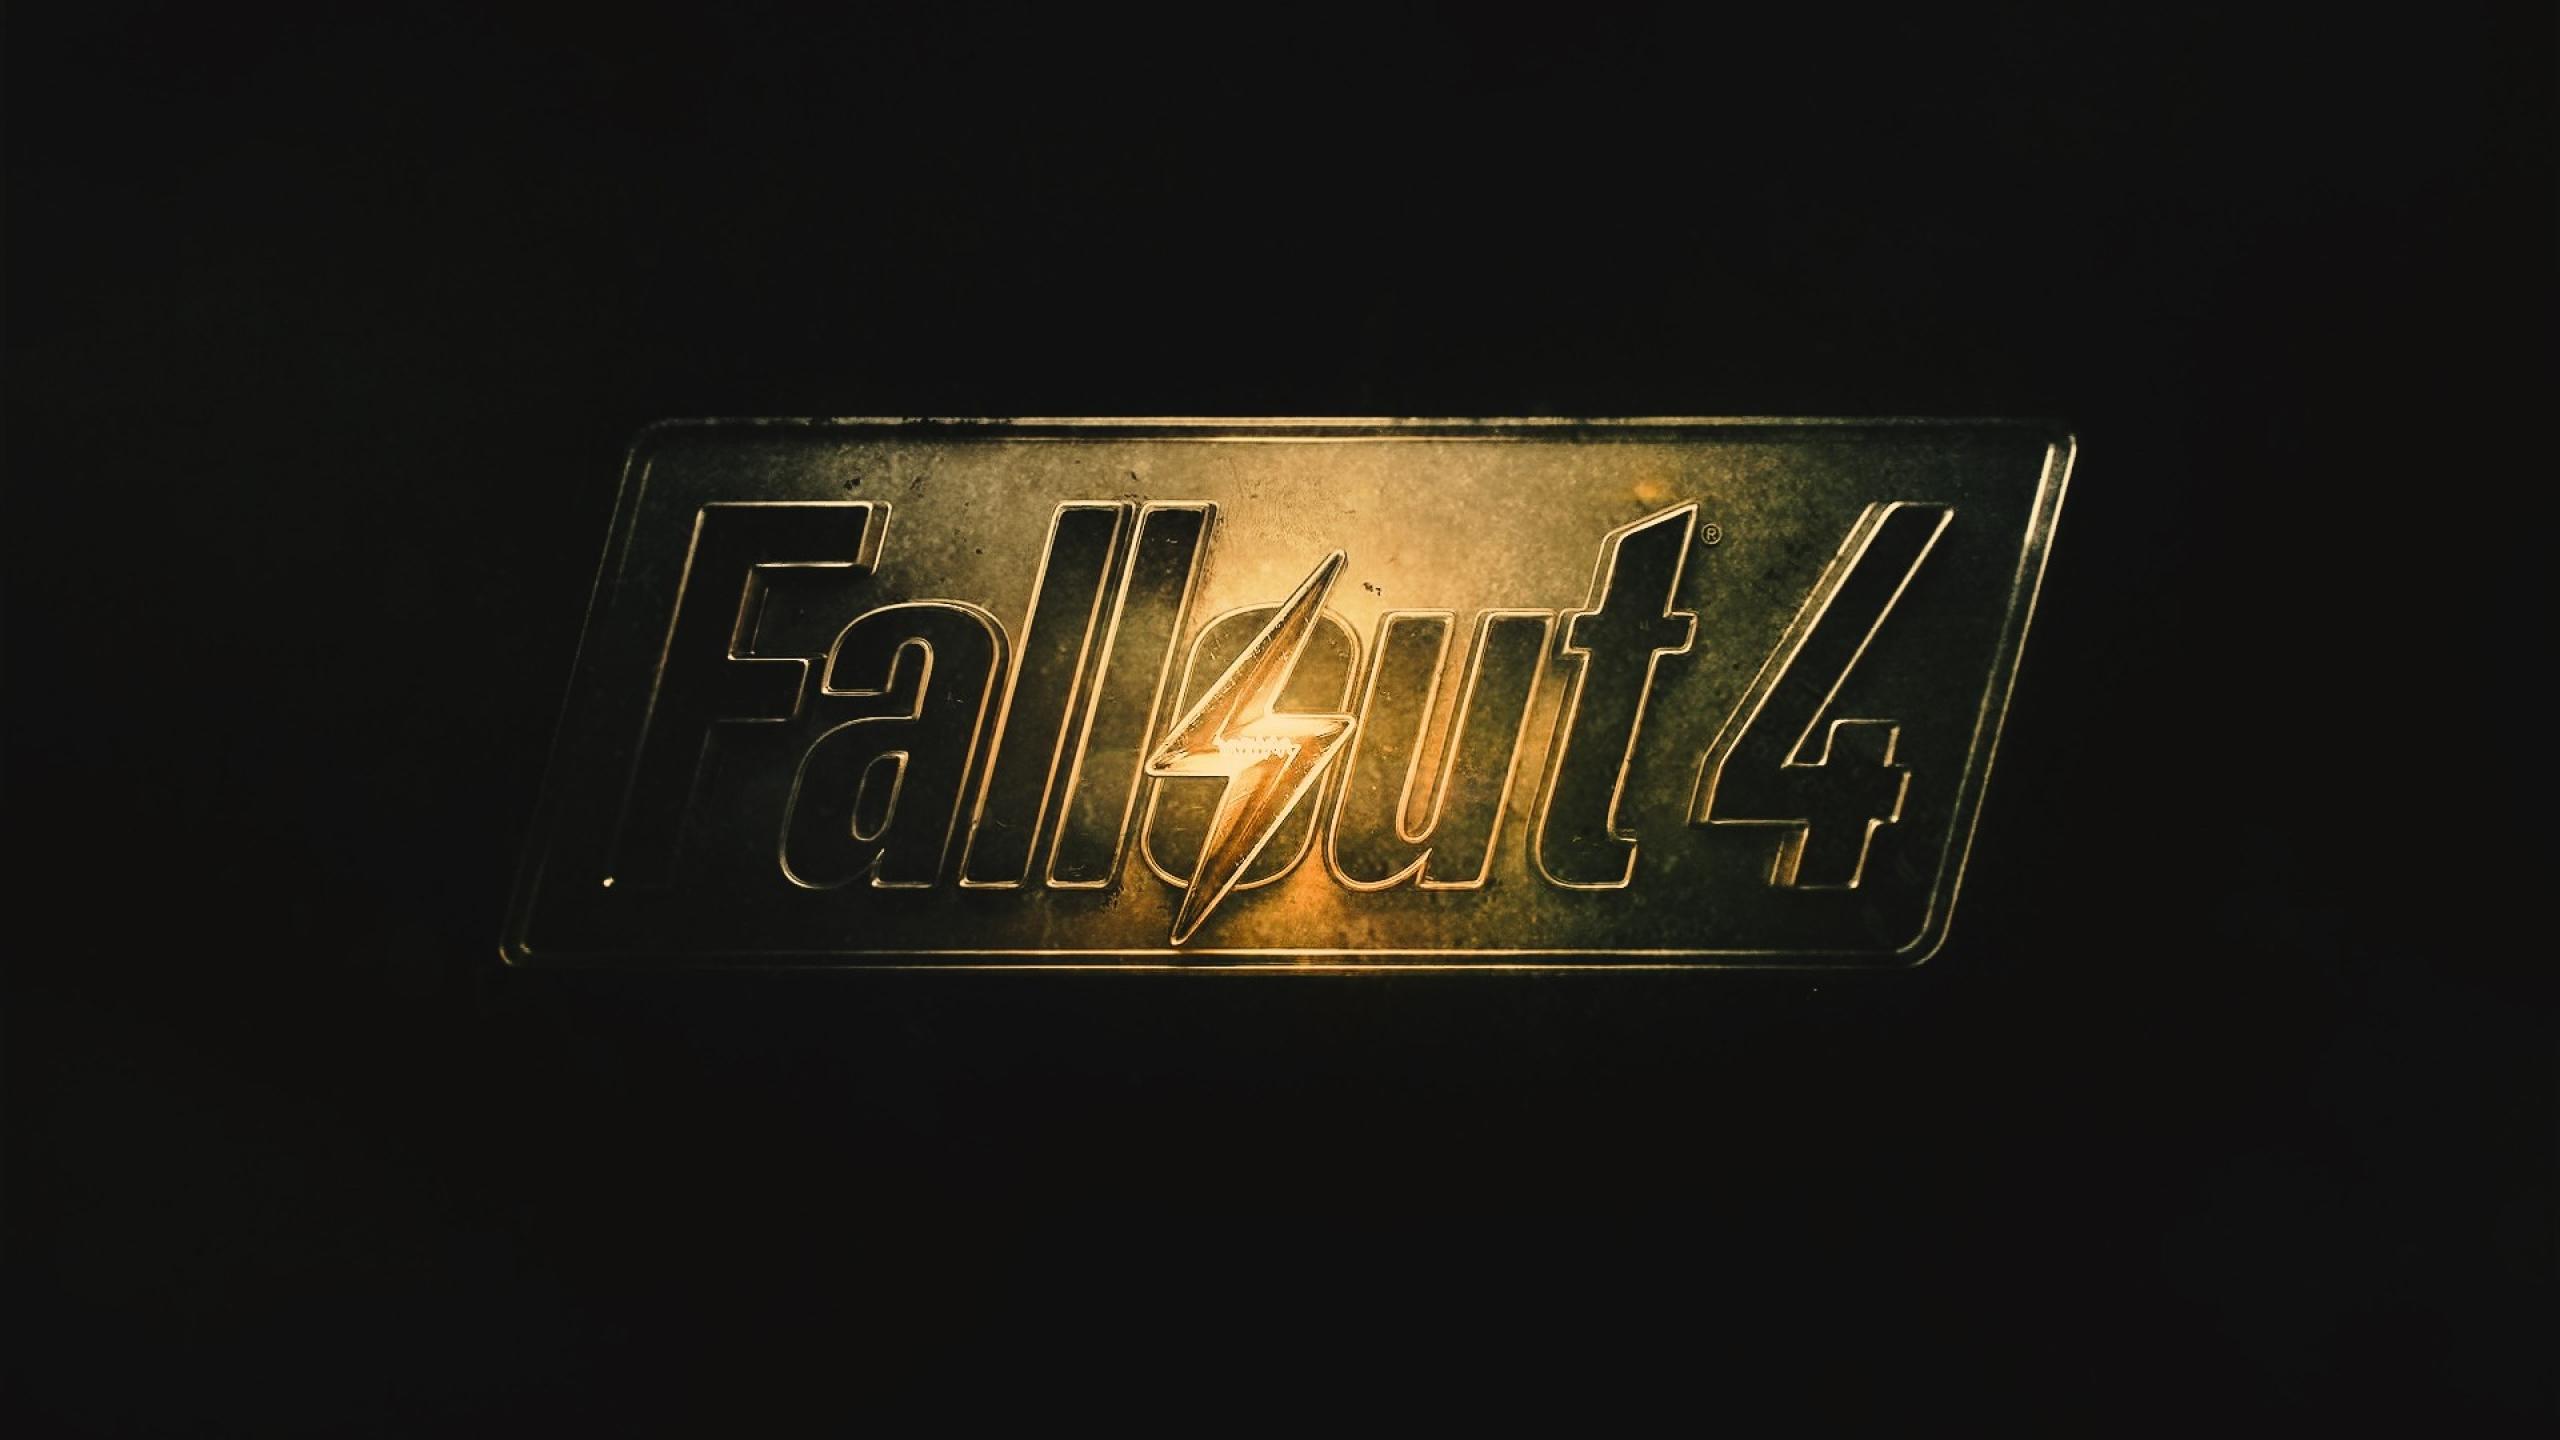 2560x1440 Fallout 4 Fallout Logo 1440p Resolution